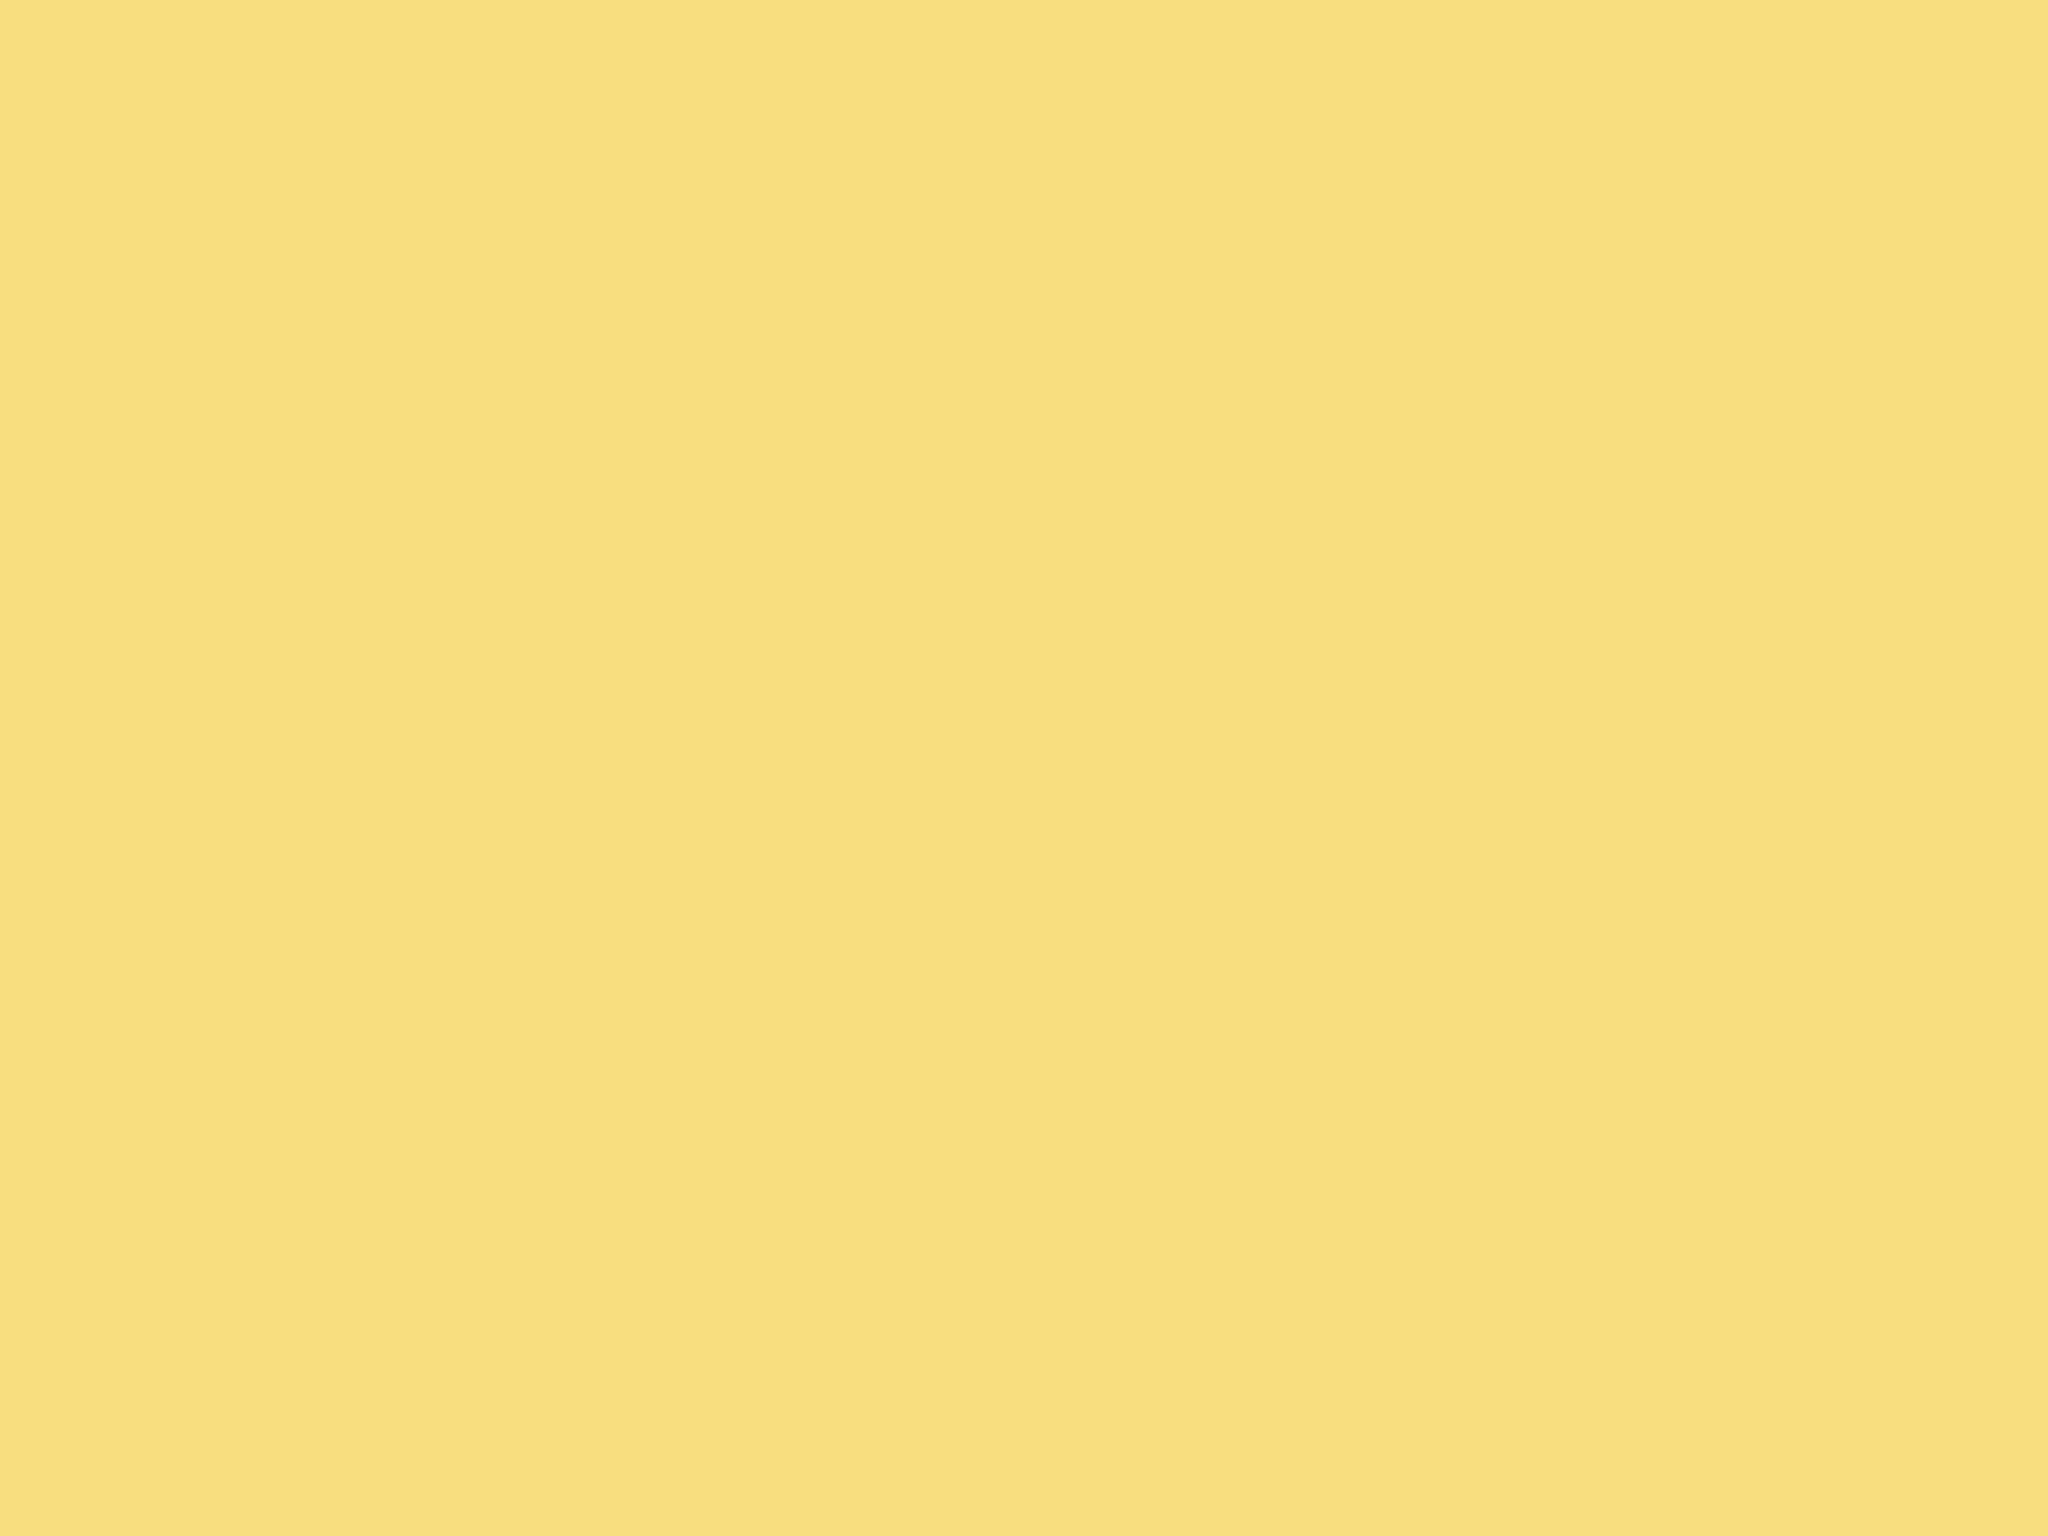 2048x1536 Jasmine Solid Color Background